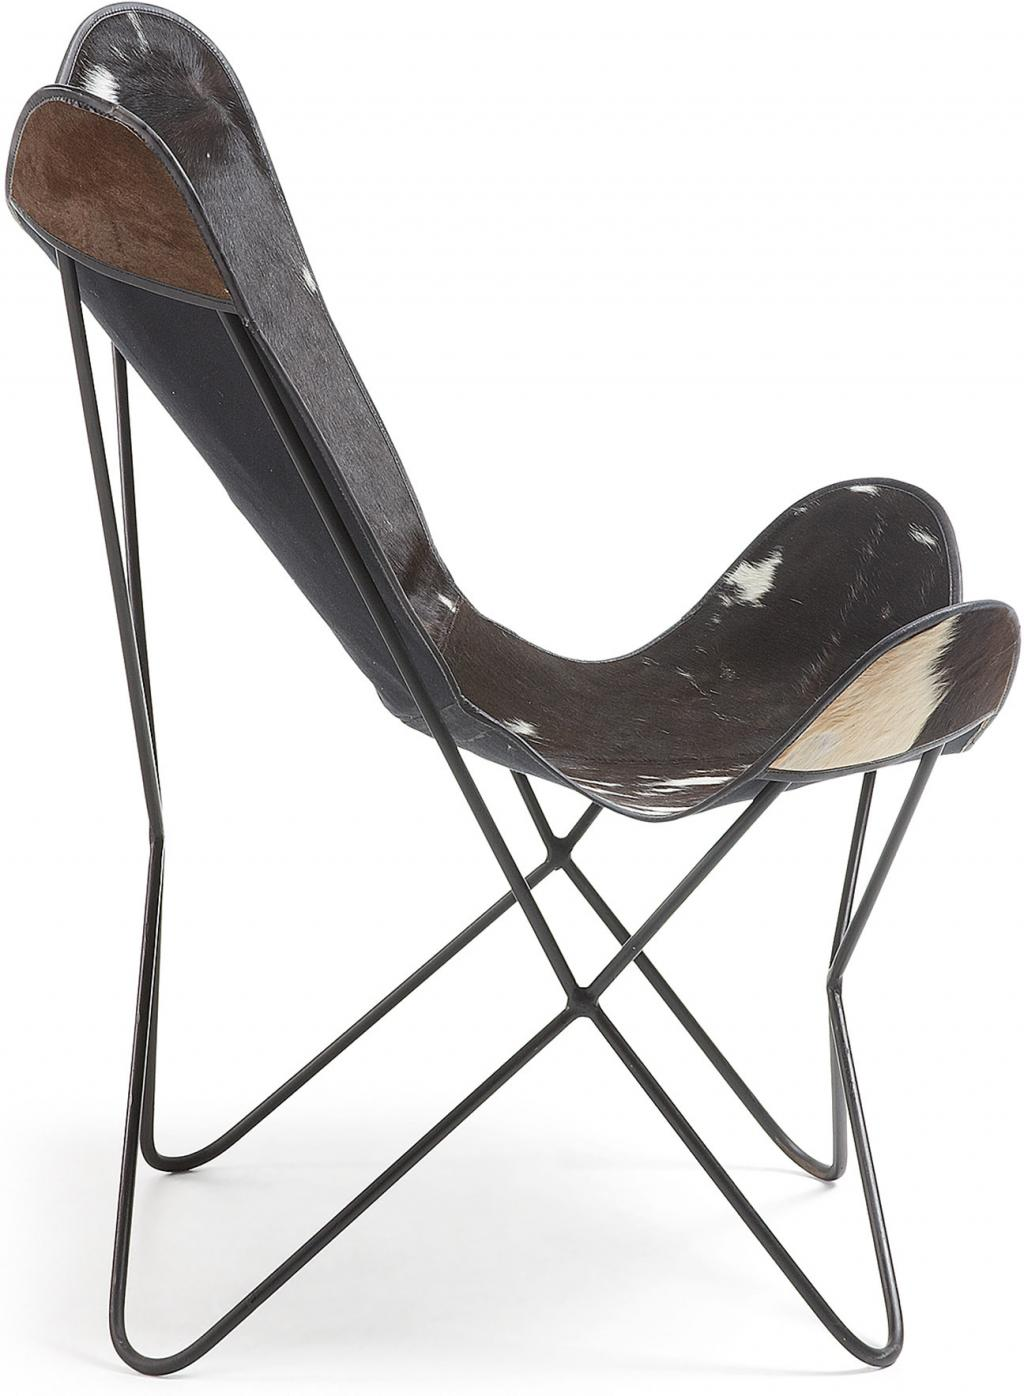 faltstuhl sessel flynn leder schwarz wei la forma kaufen wohn und. Black Bedroom Furniture Sets. Home Design Ideas